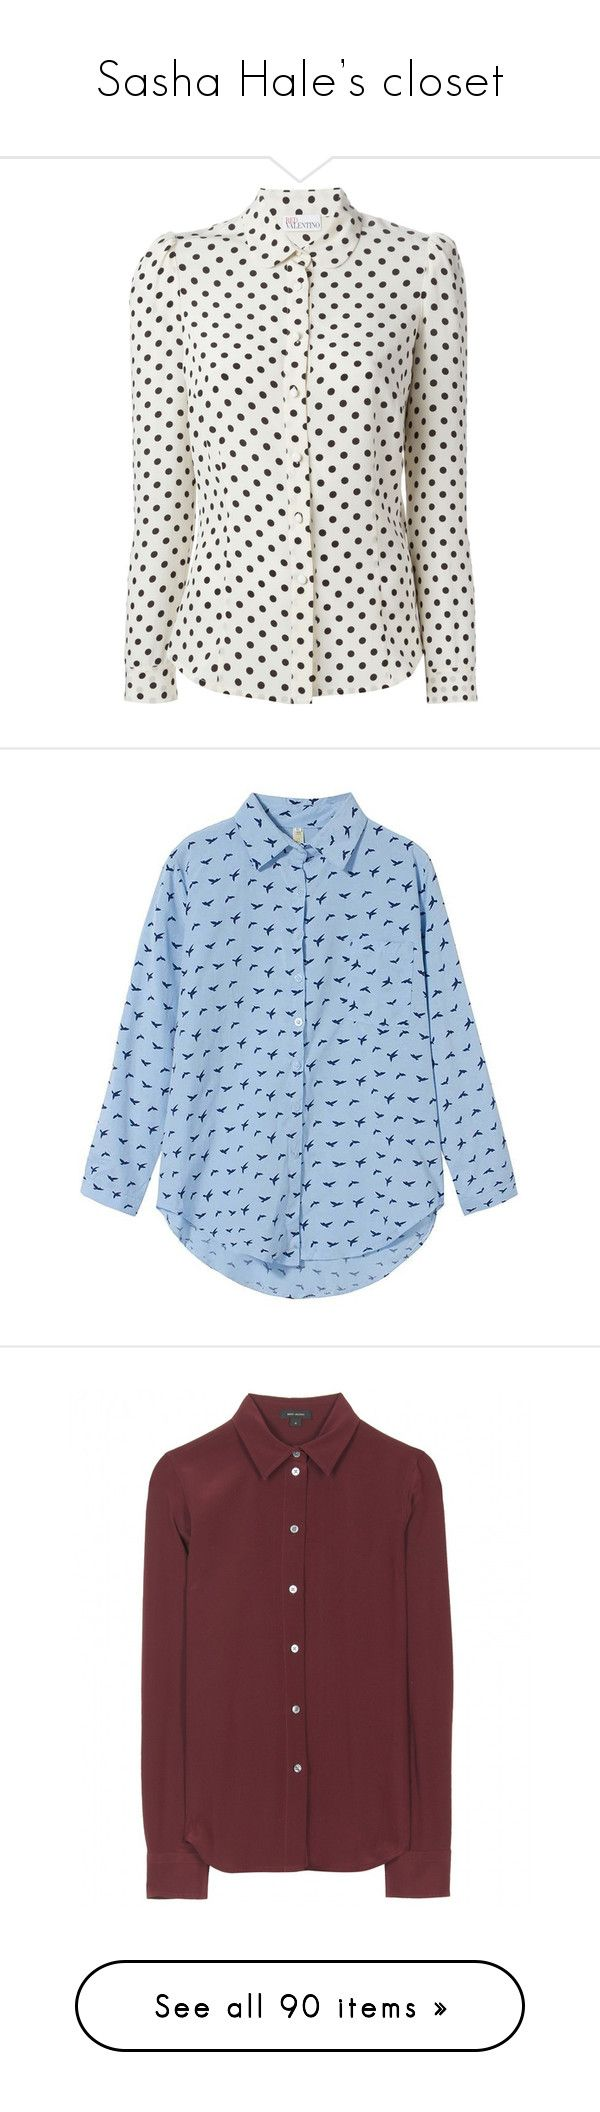 """Sasha Hale's closet"" by samtiritilli ❤ liked on Polyvore featuring tops, blouses, shirts, long sleeves, polka dot long sleeve shirt, peter pan collar shirts, ivory blouse, button front shirt, silk blouse and long-sleeve crop tops"